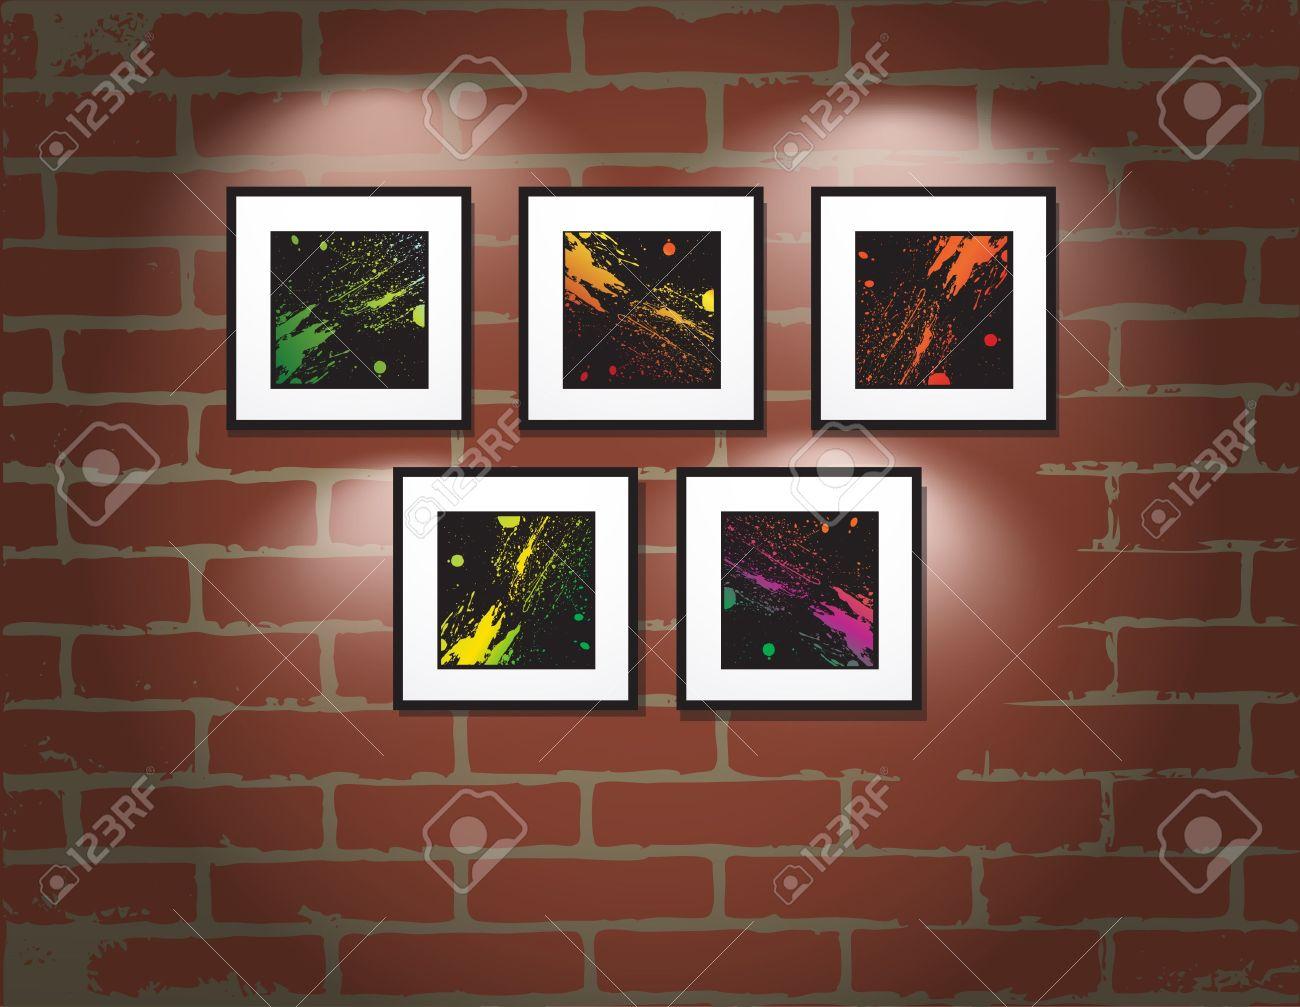 Frame On Brick Wall Art Gallery Illustration Stock Vector